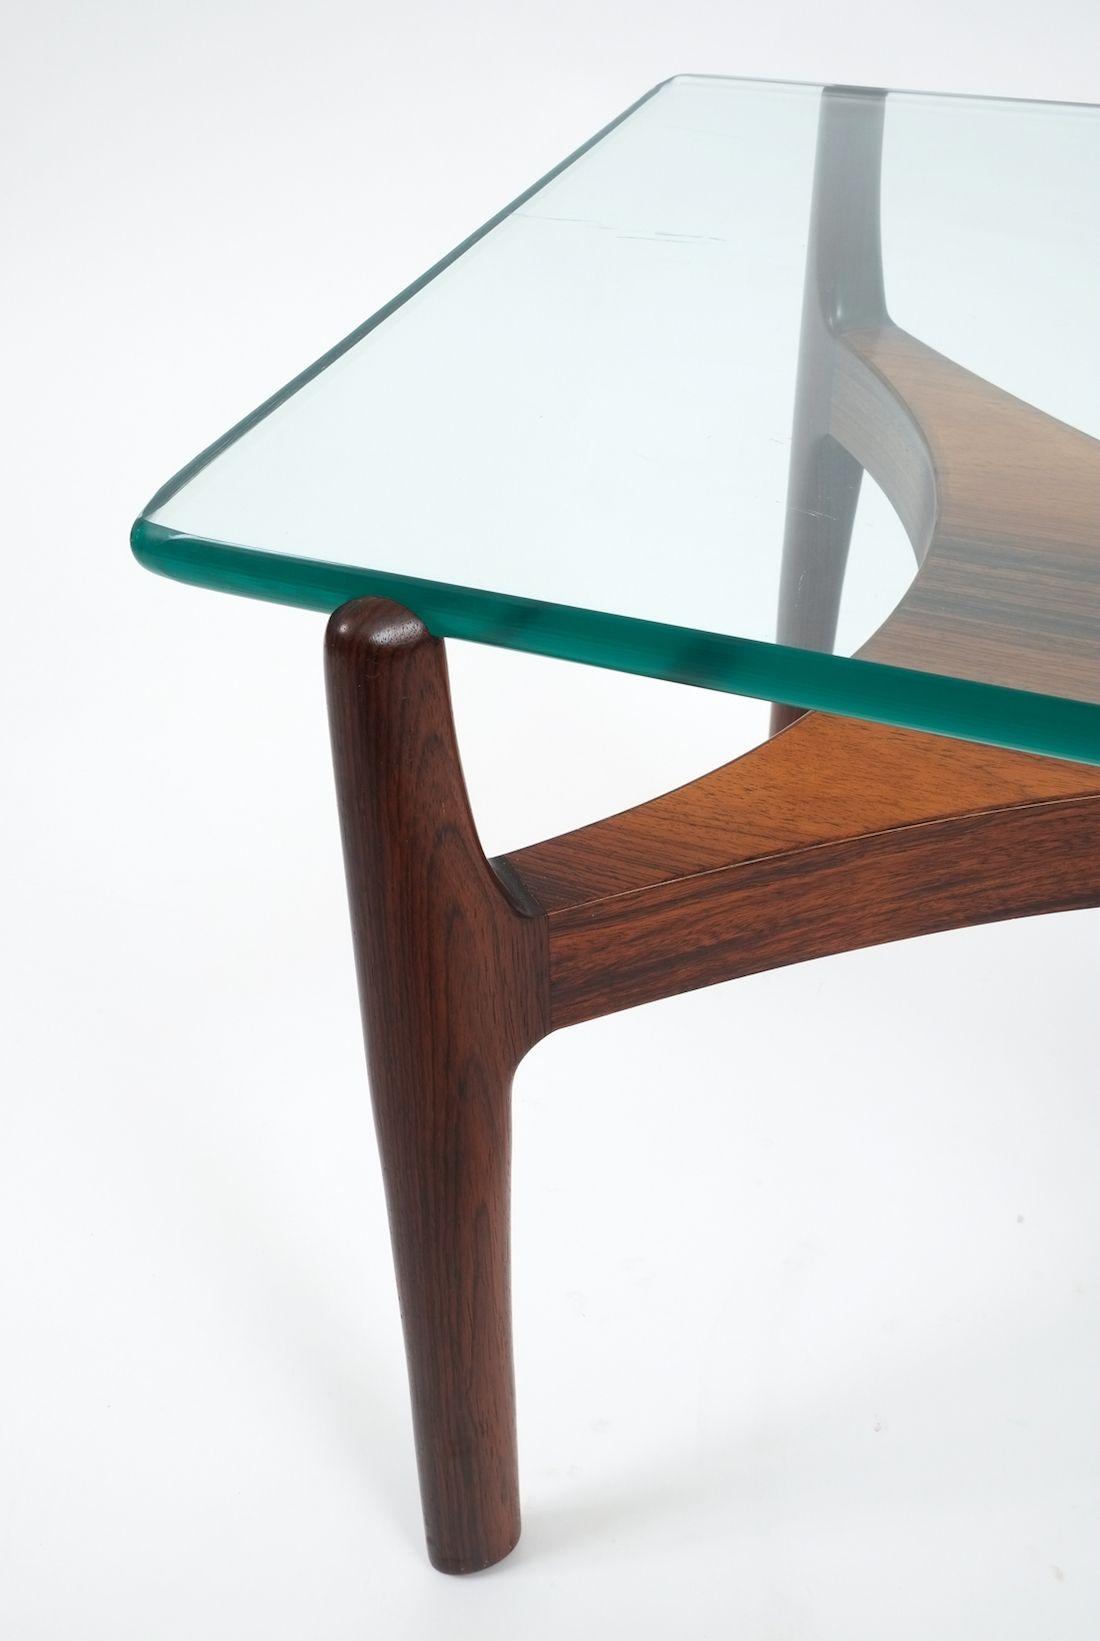 Sven Ellekaer Teak Glass Coffee Or Side Table 1960 Derive Vienna [ 1641 x 1100 Pixel ]